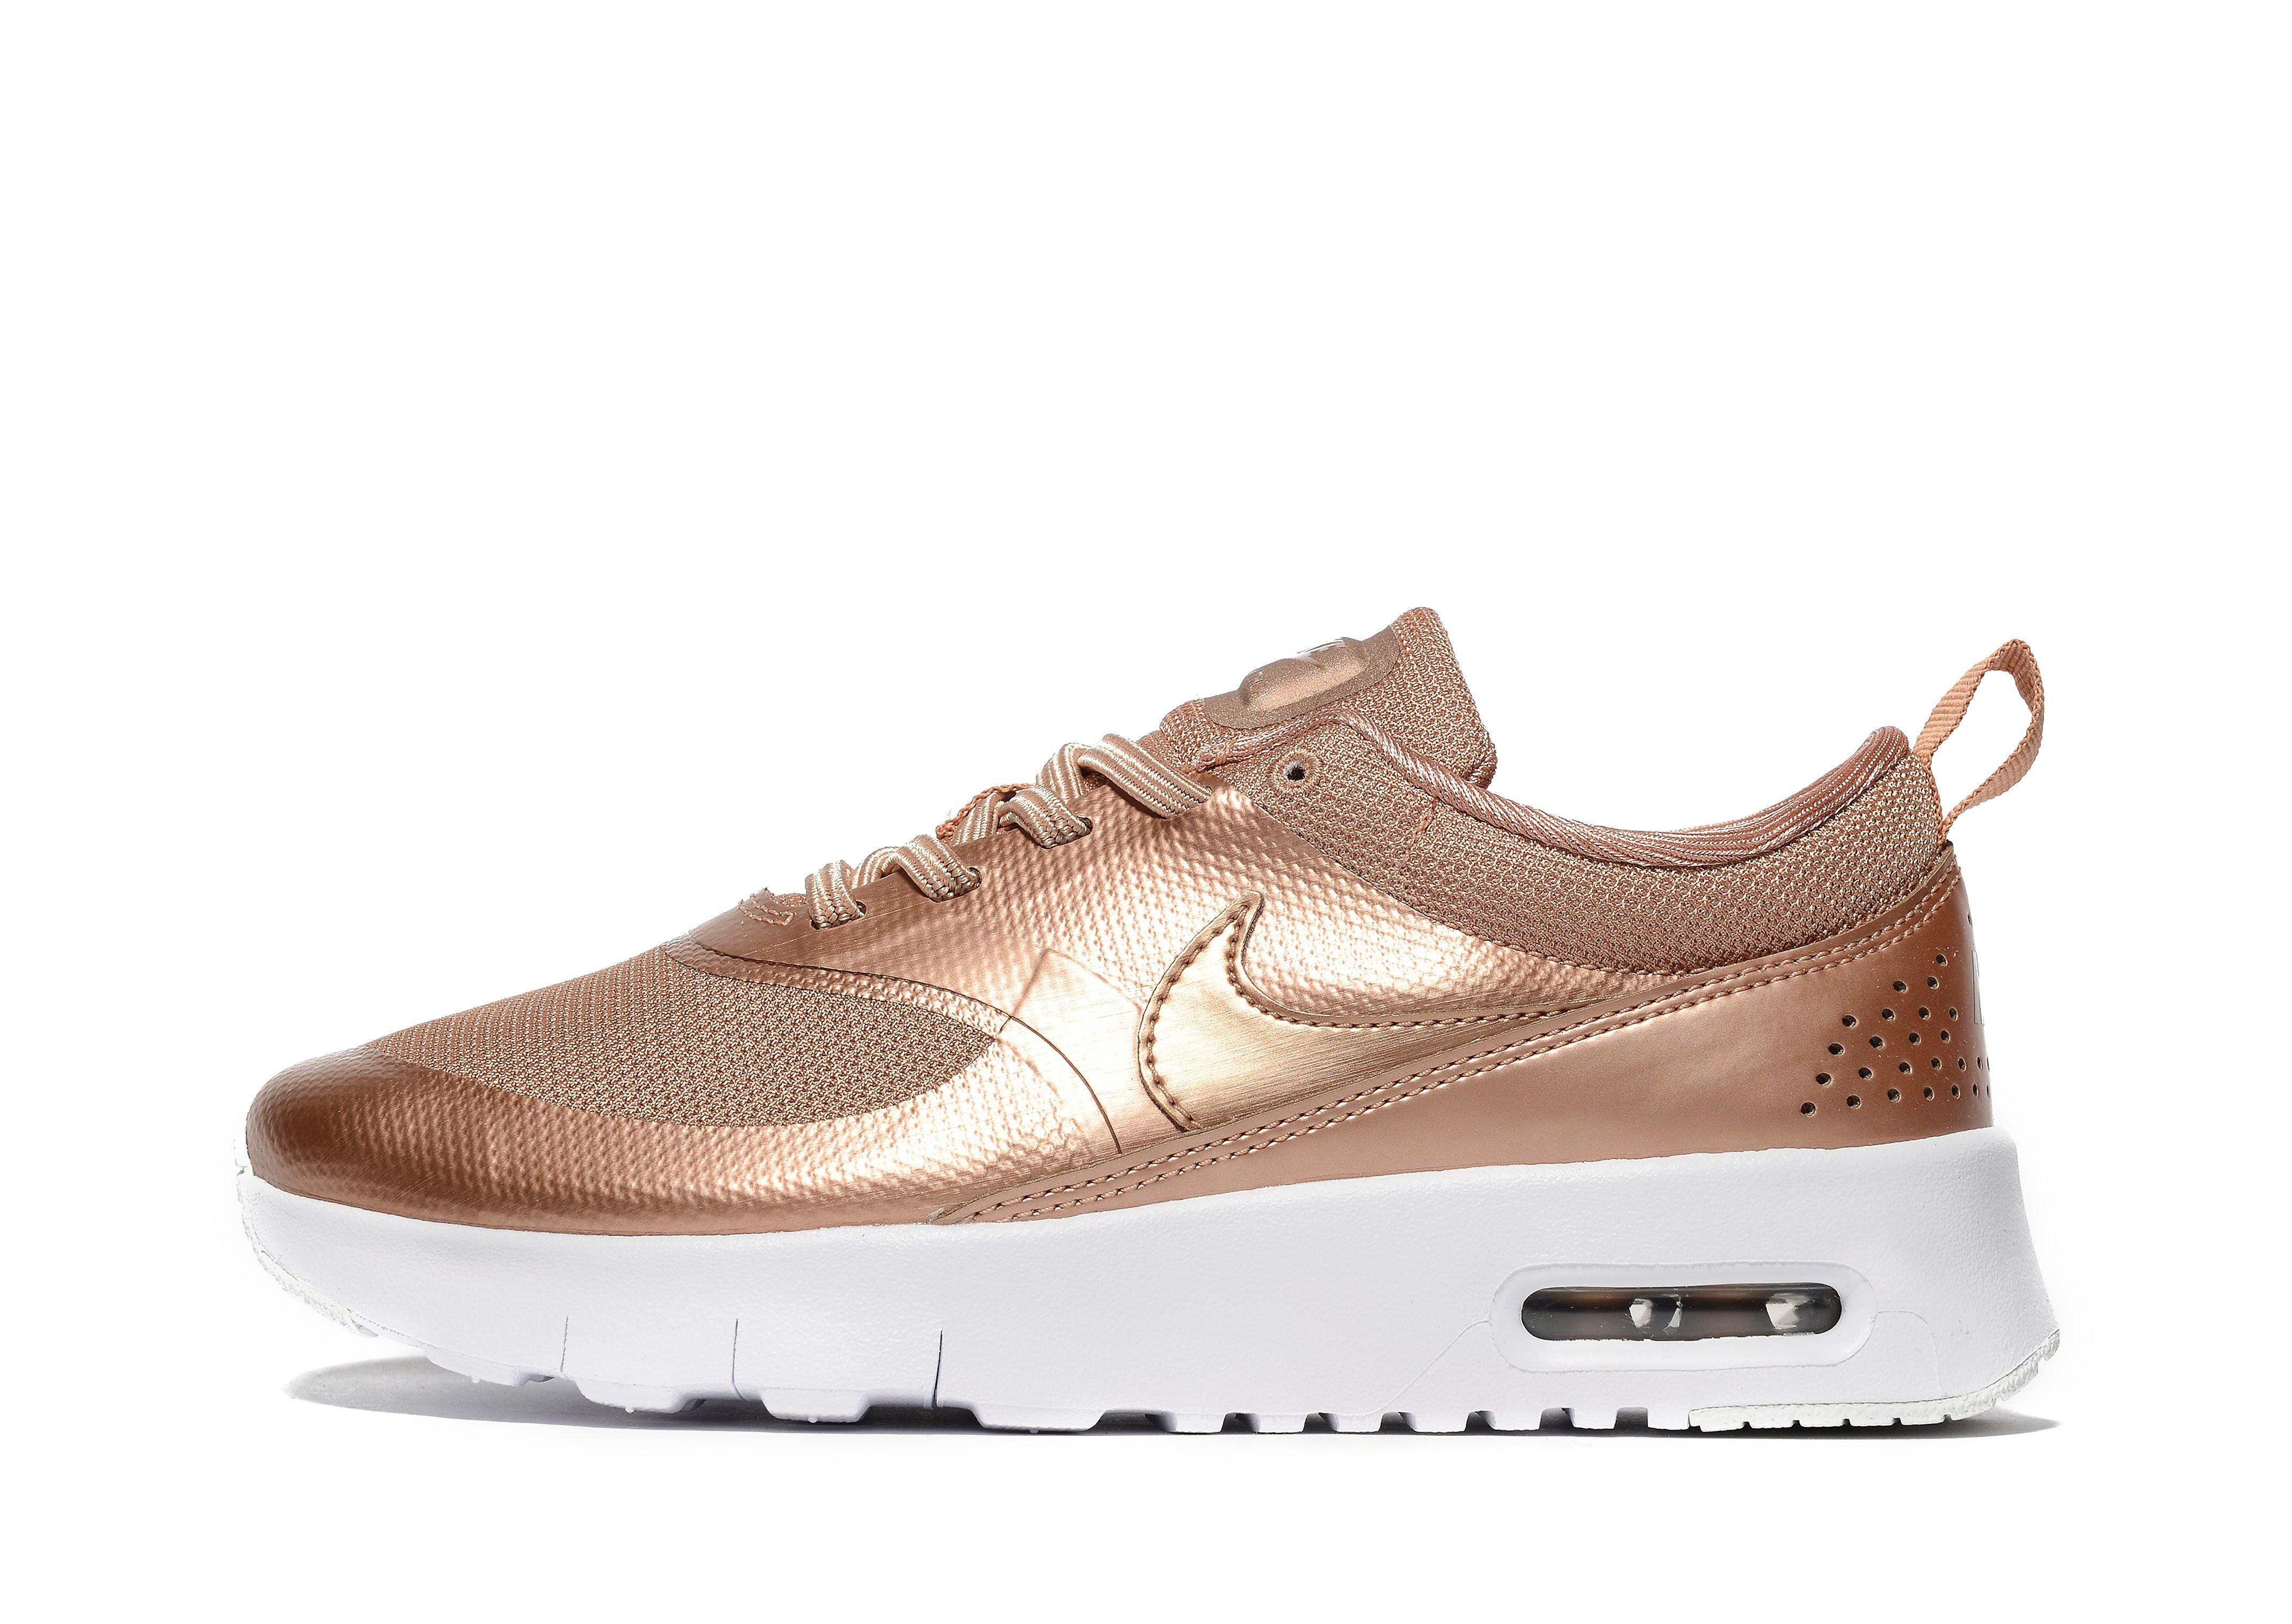 Nike Air Max Thea Premium Children